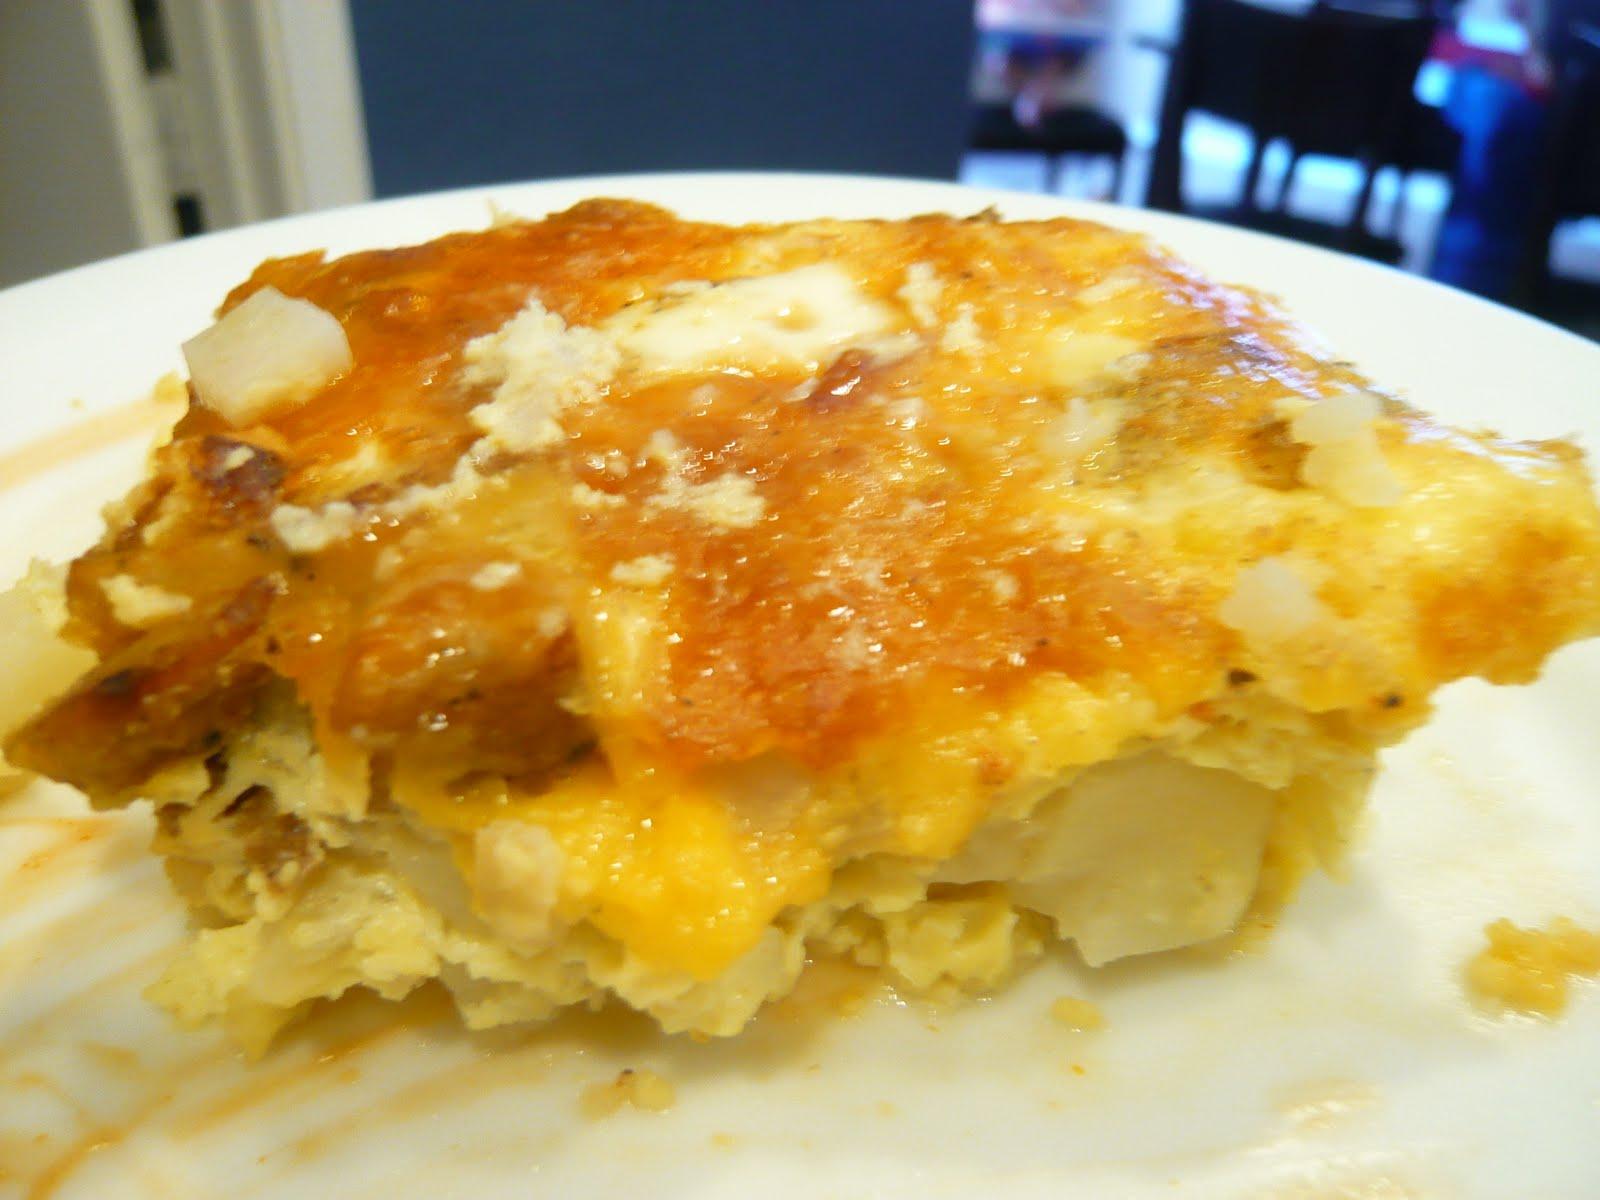 28 Best - Baked Egg Breakfast Casserole - baked ham and ...